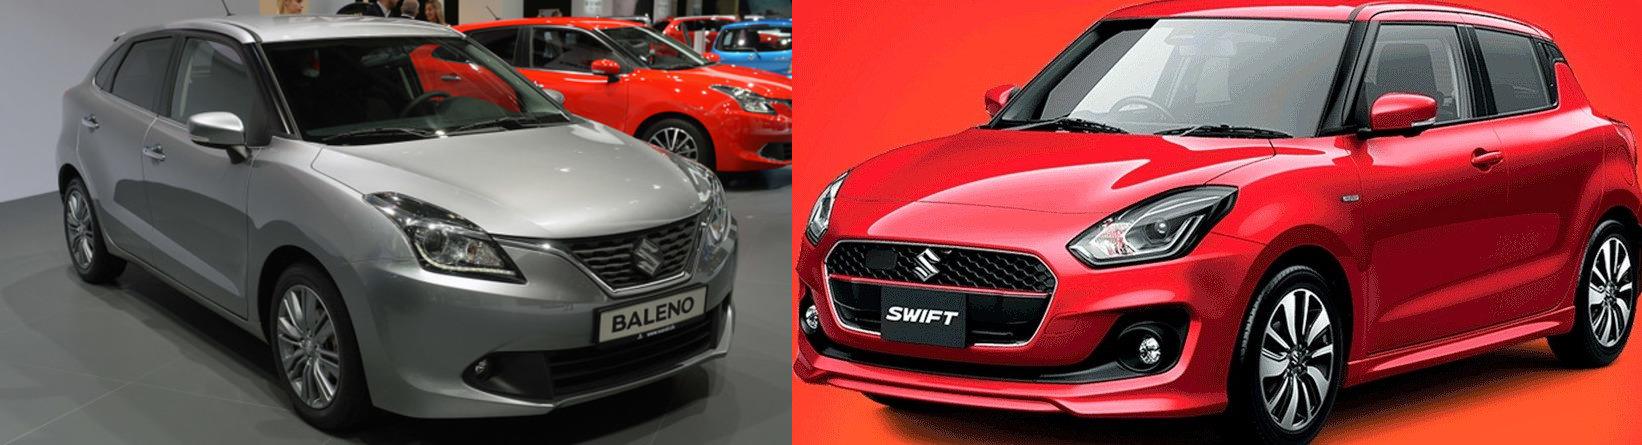 Maruti Swift 2018 Facelift or Baleno  Review Best Hatchback